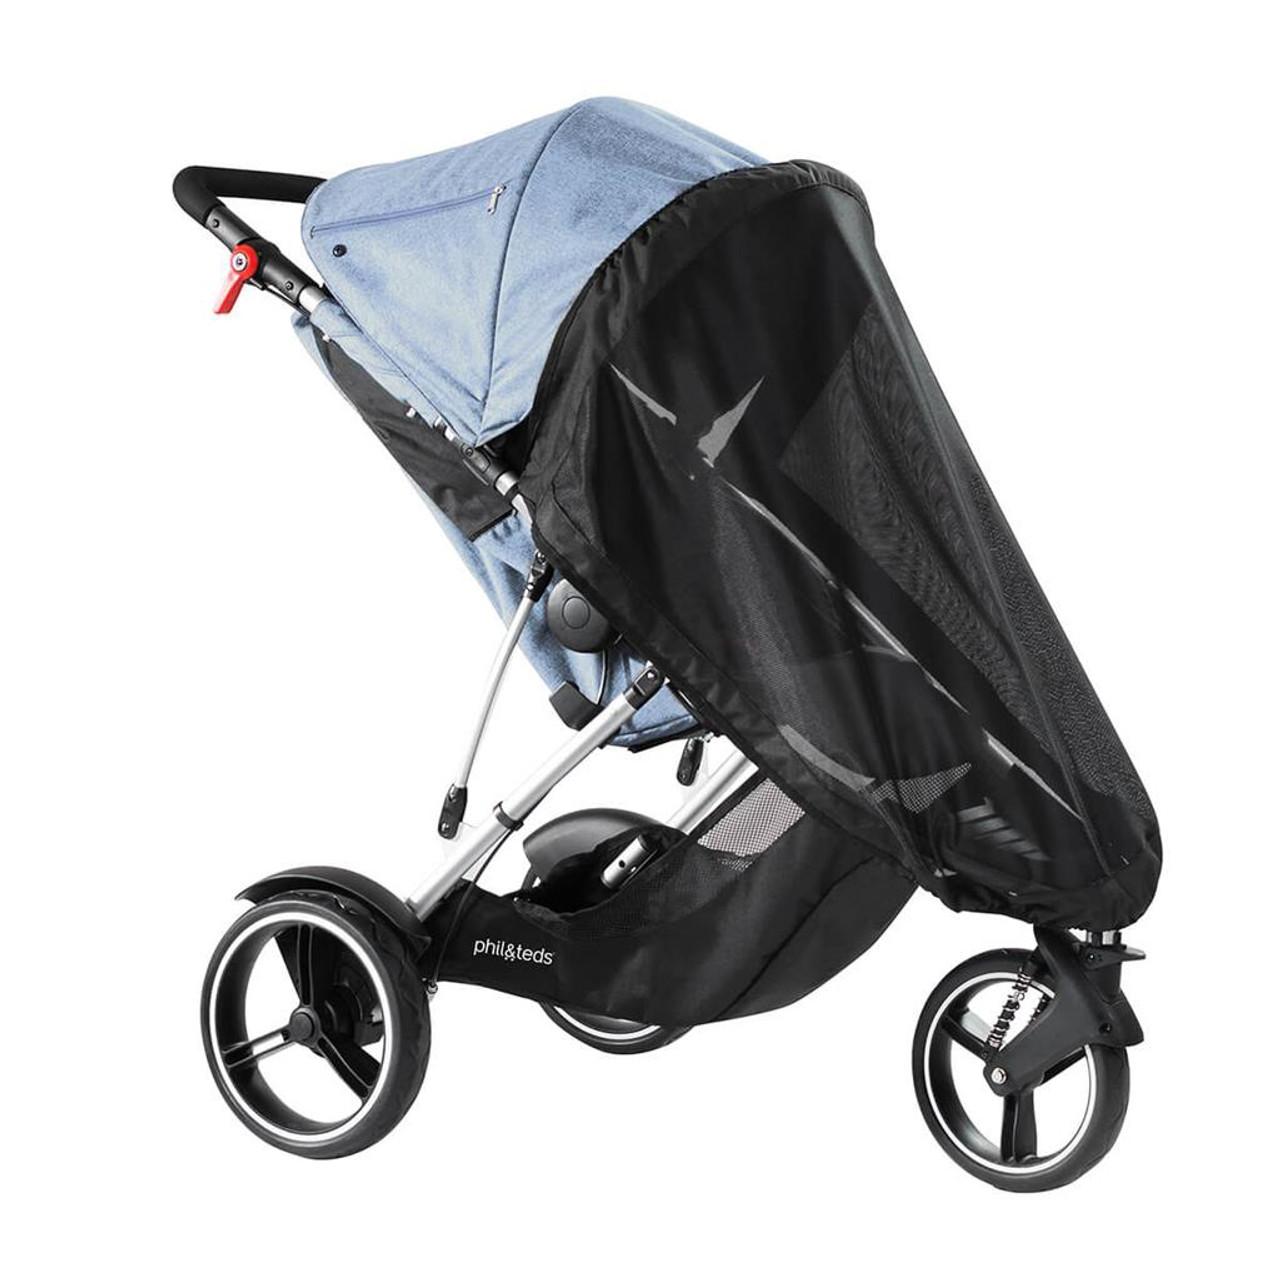 Phil & Teds Sport Dot Dash V6 Mesh Cover at Baby Barn Discounts Phil & Teds custom fit sun mesh cover for the Sport Dot & Dash stroller 2019+